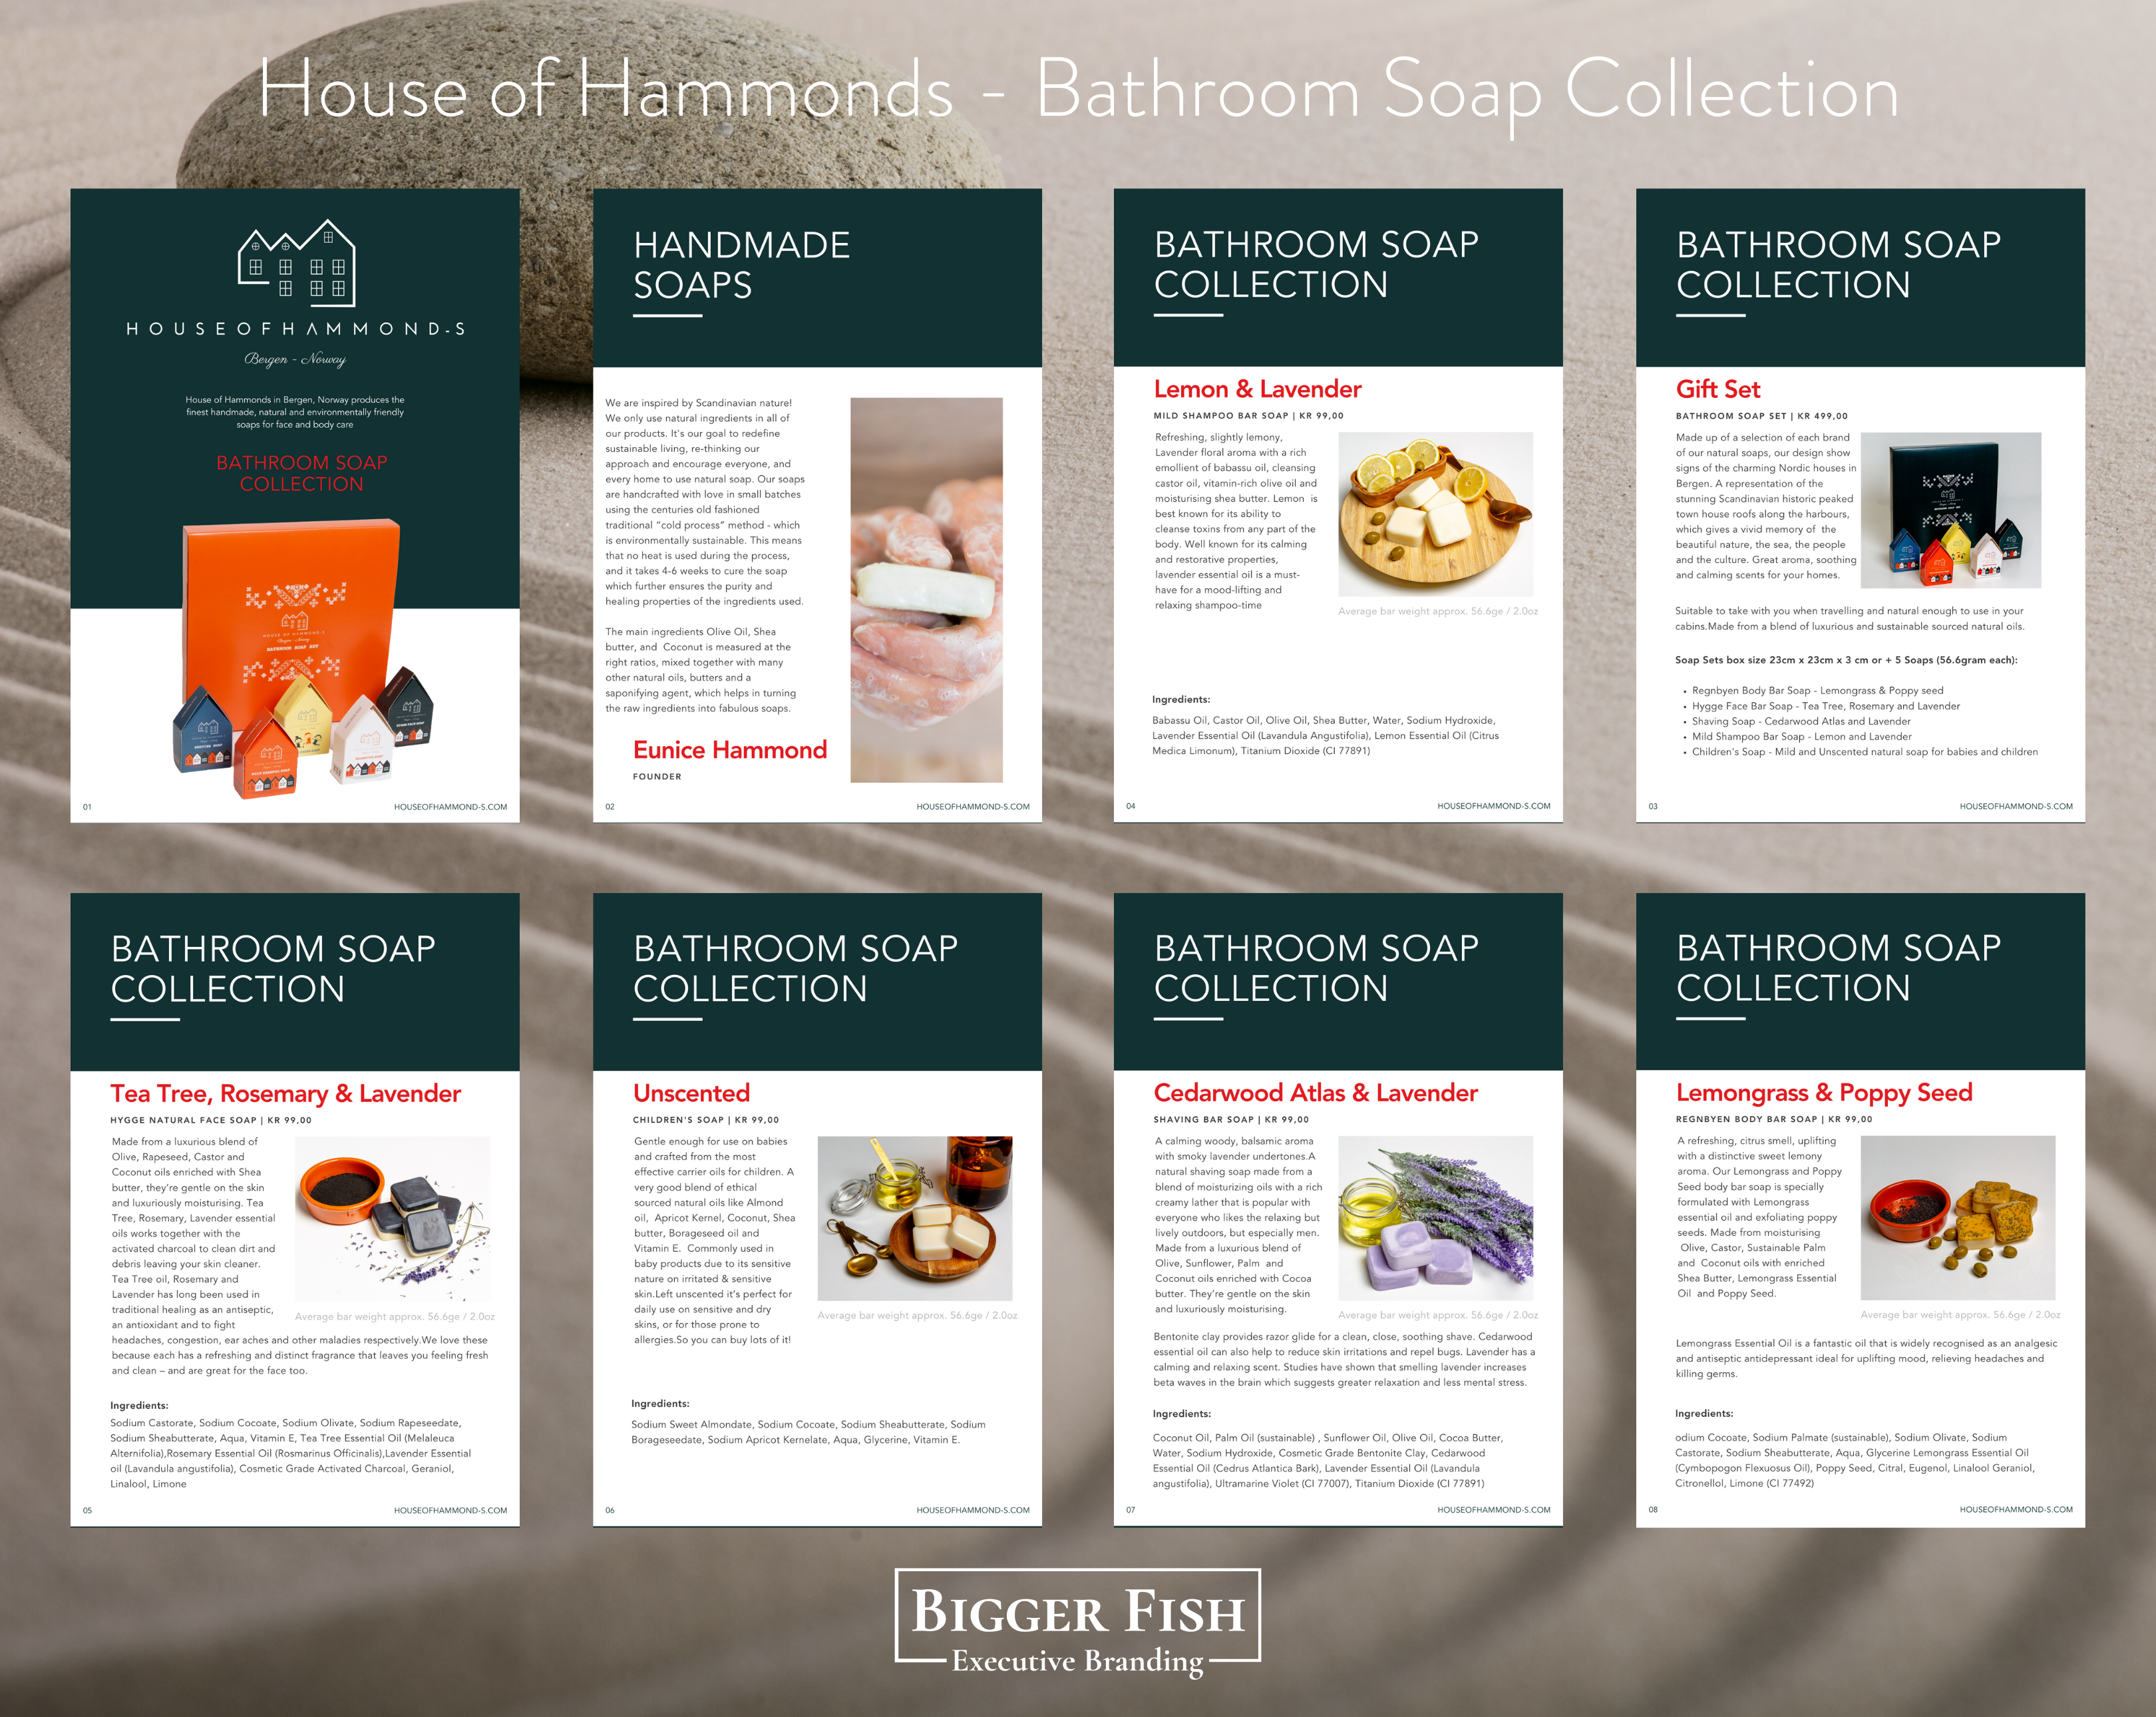 House of Hammonds - Bathroom Soap Collec